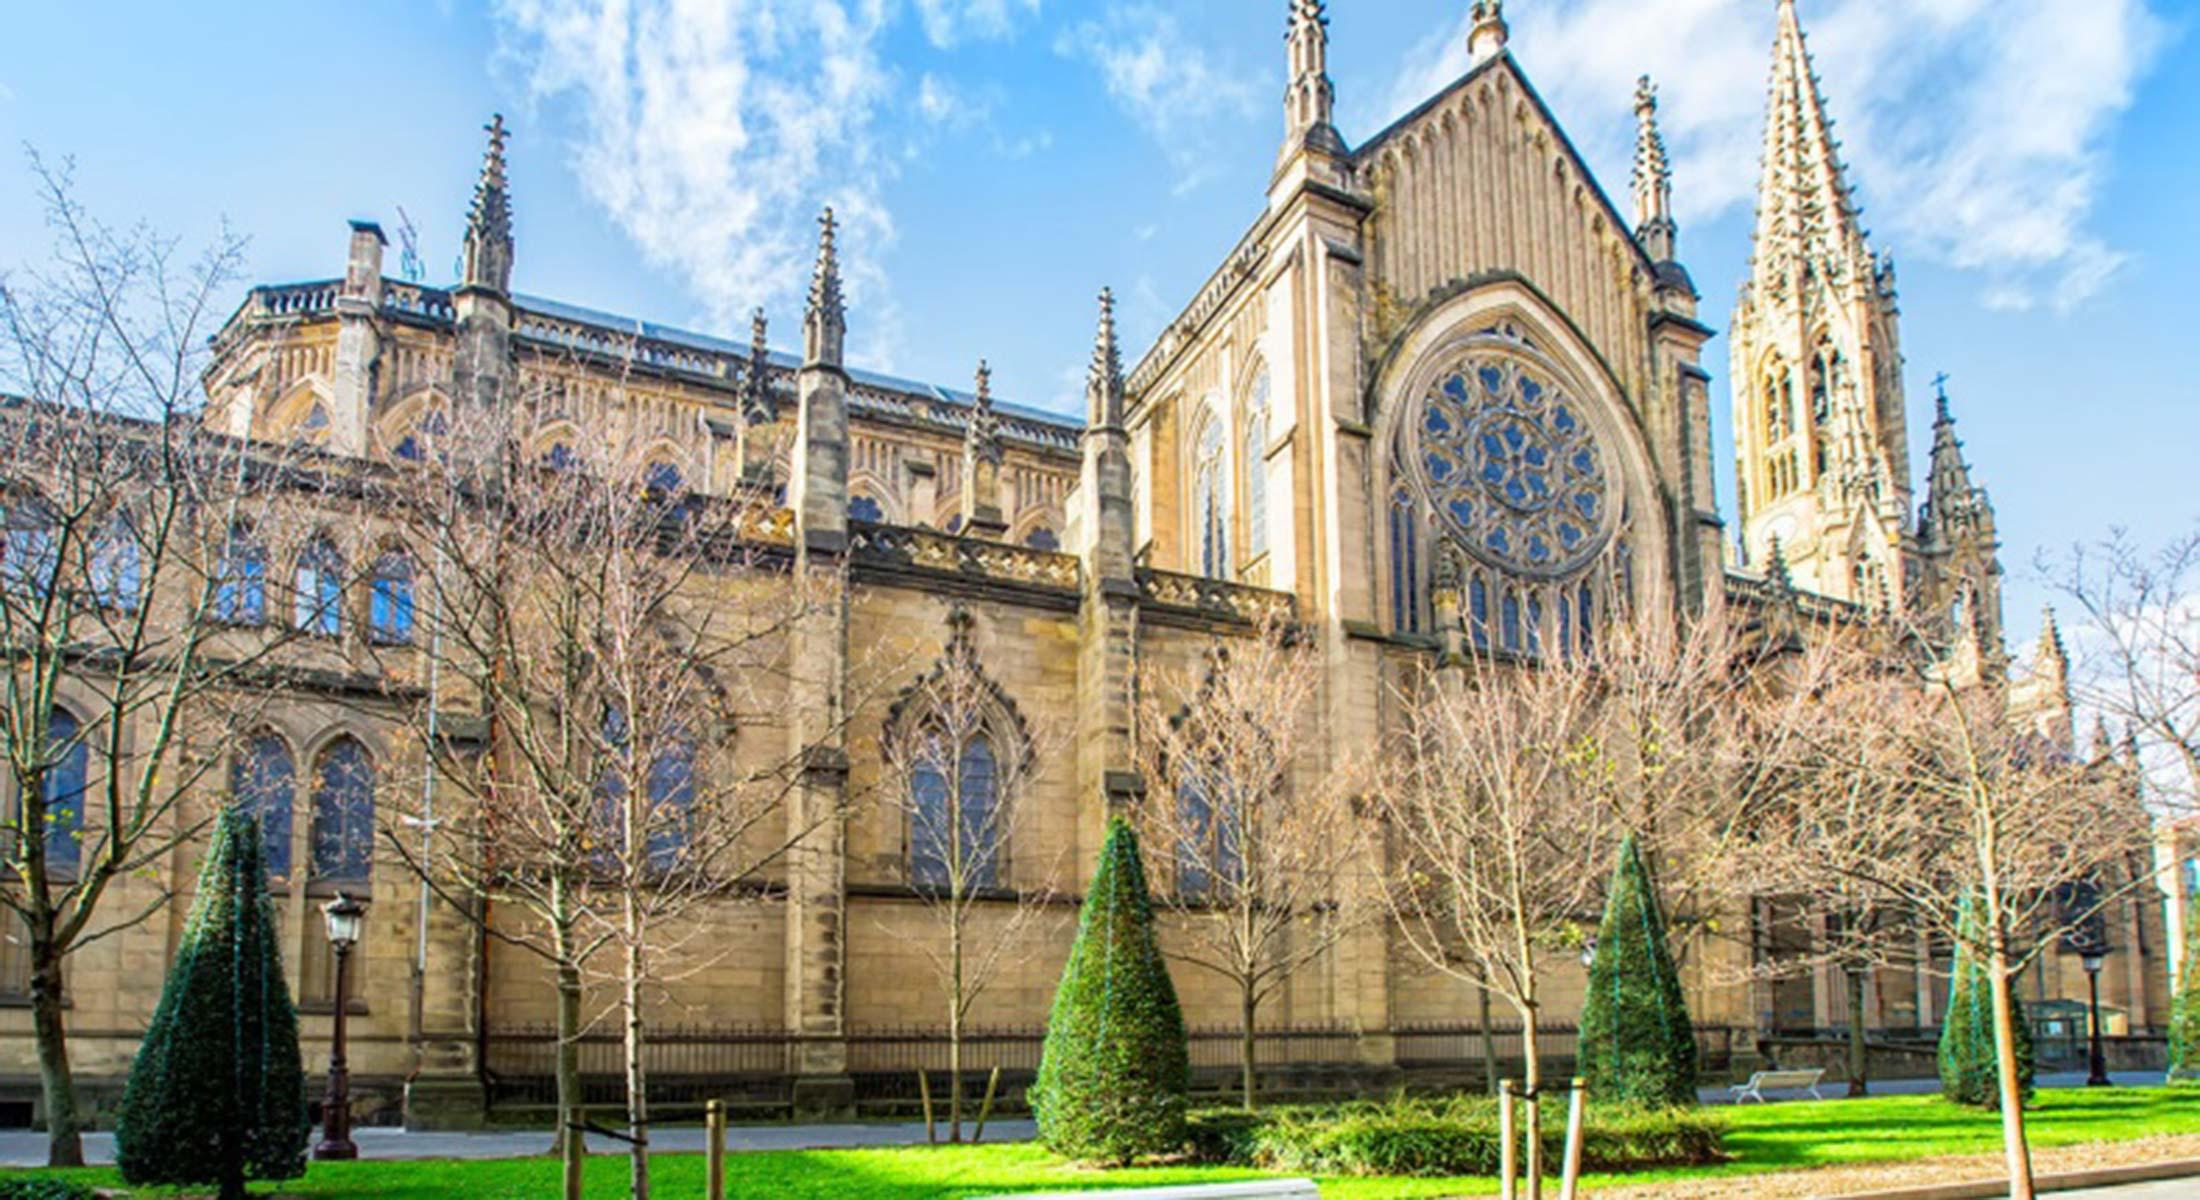 Arrizul Catedral Hotel⋆⋆⋆